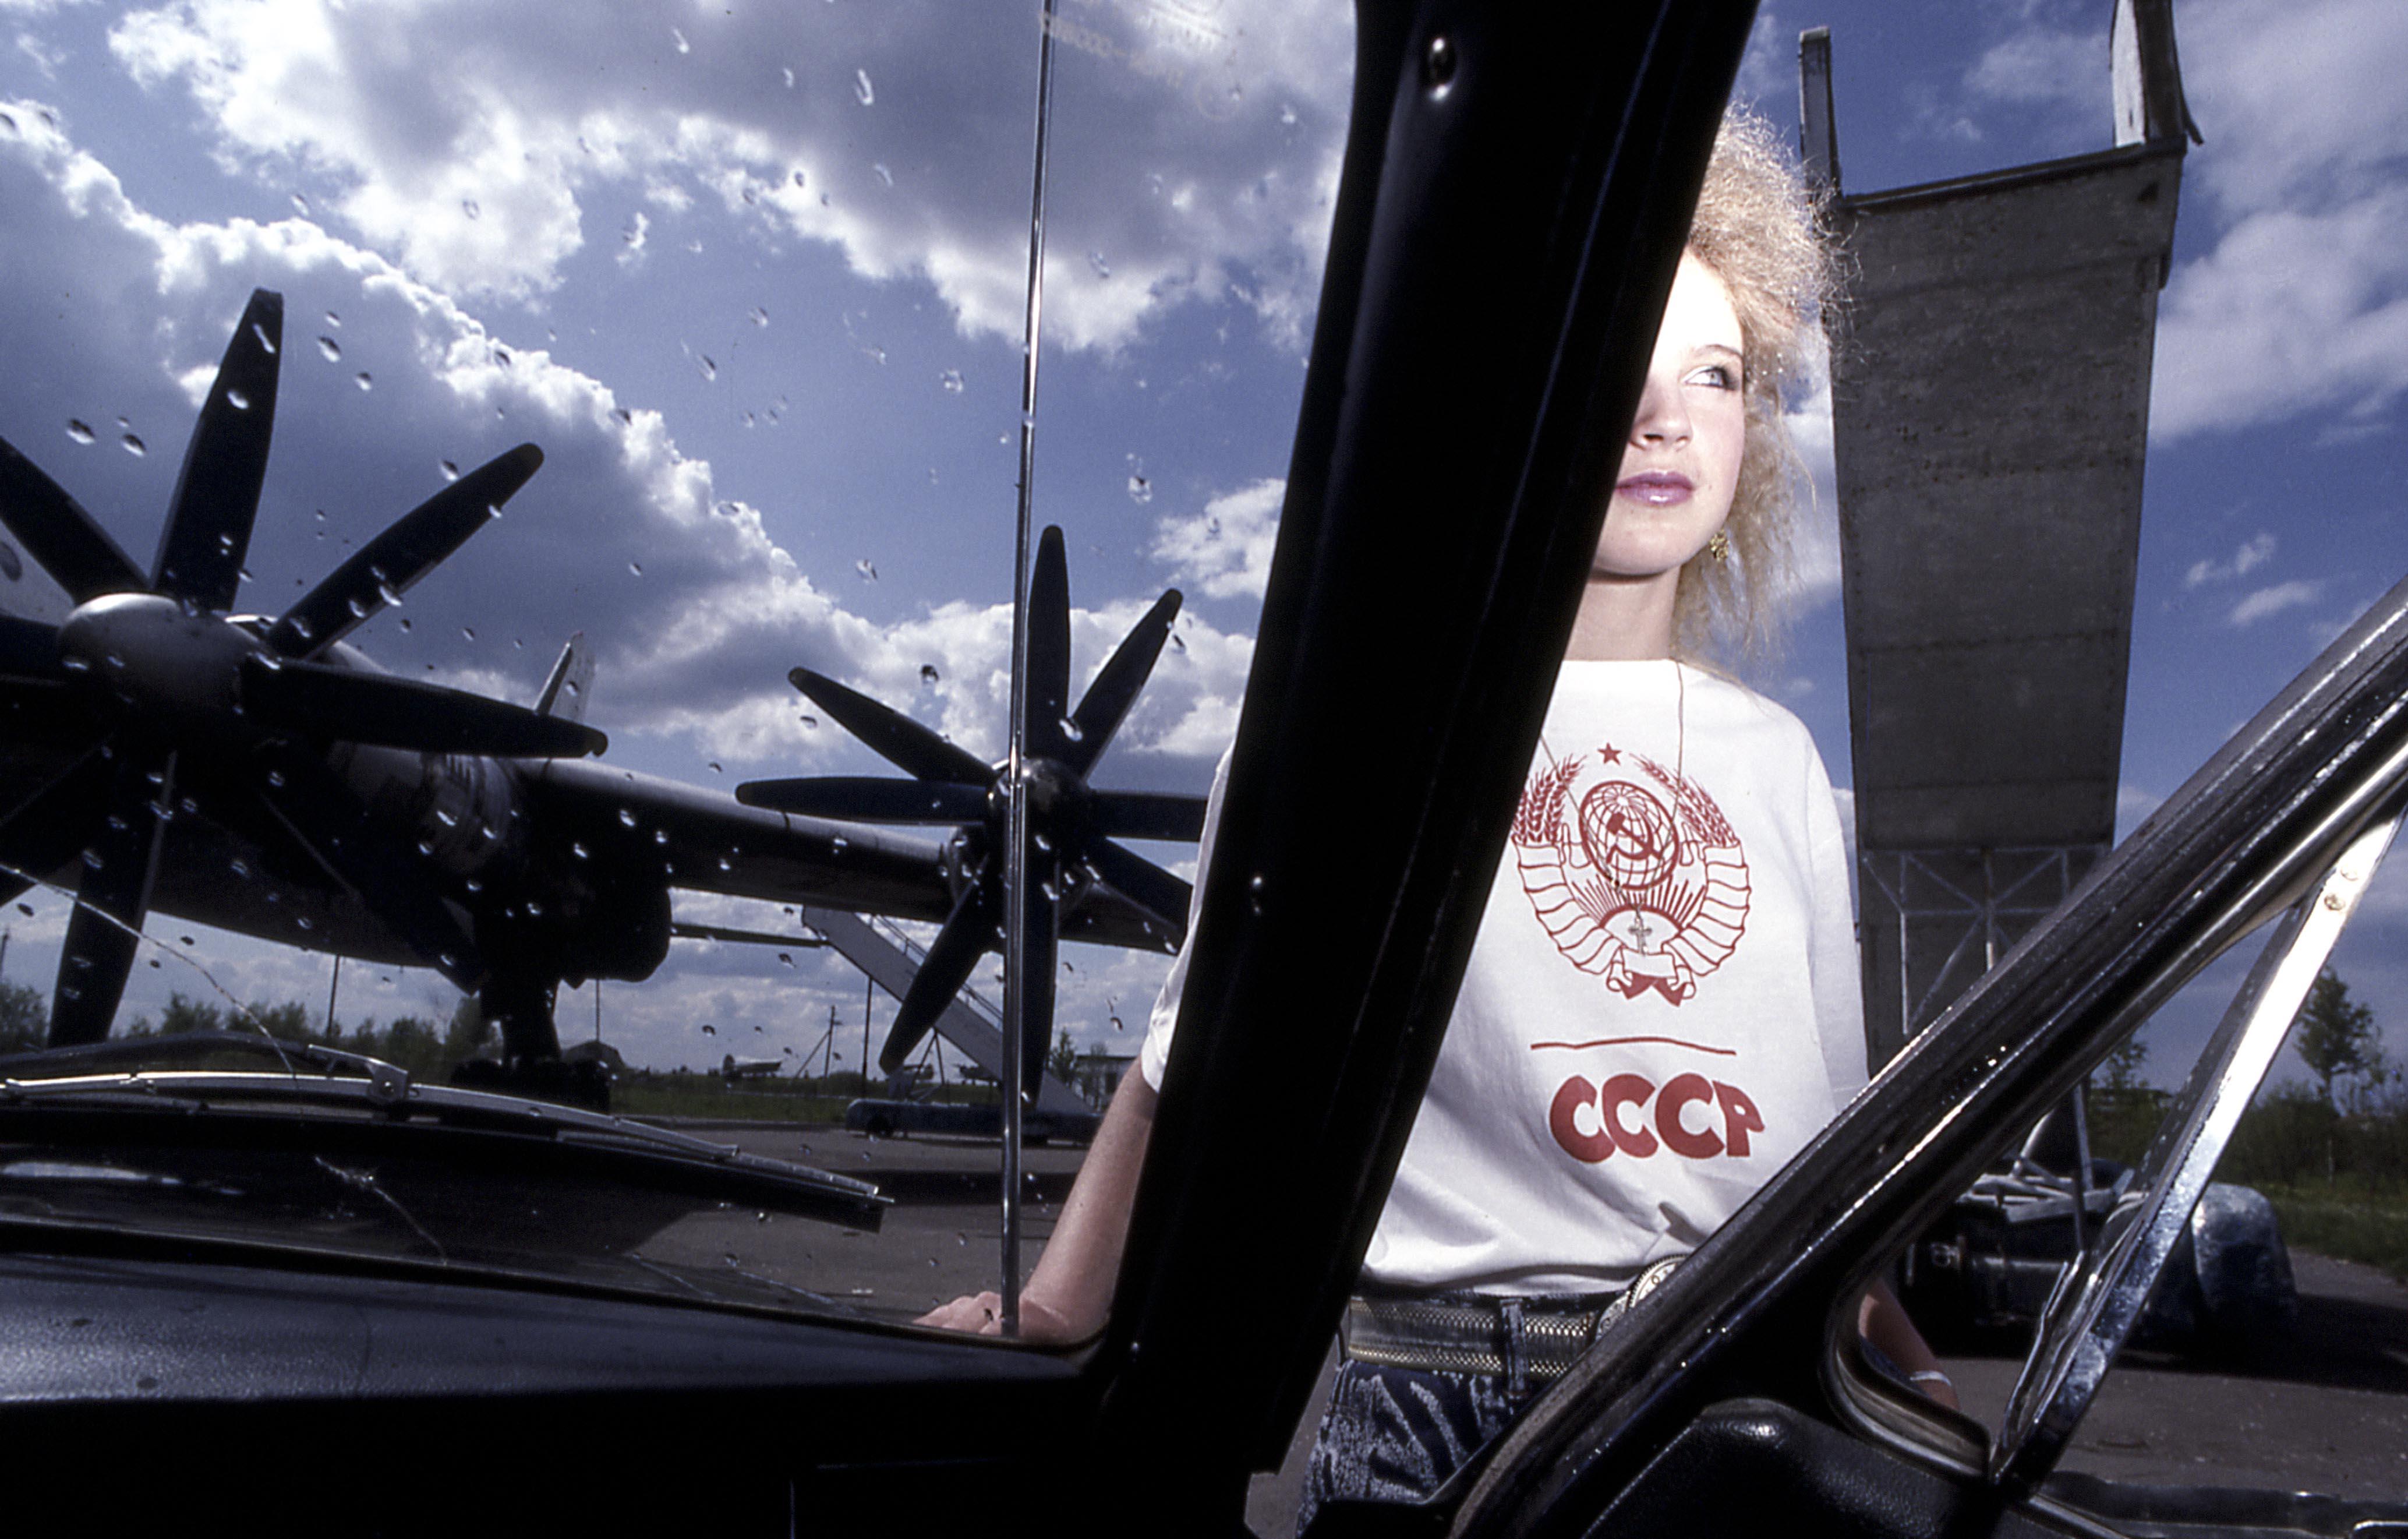 Ruskaïa de Luc Choquer, portraits de jeunes femmes Russes.